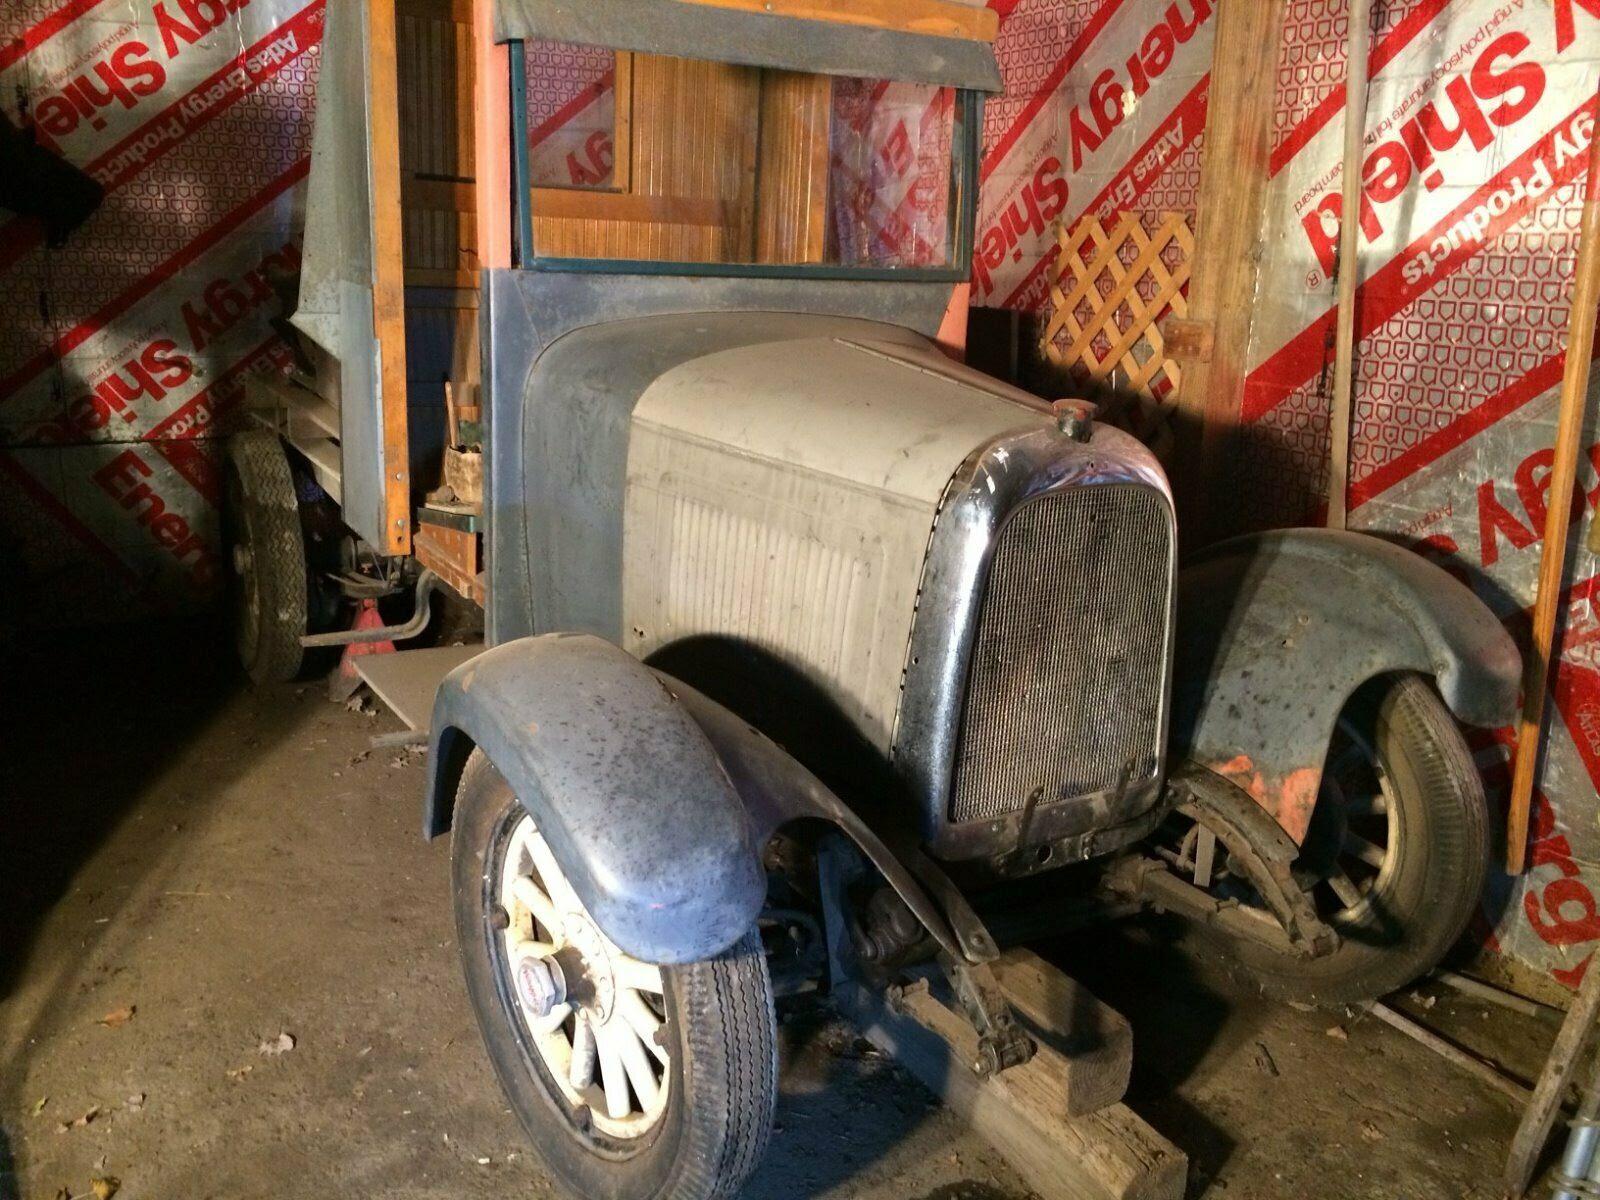 Craigslist Port Angeles Cars And Trucks - Carports Garages